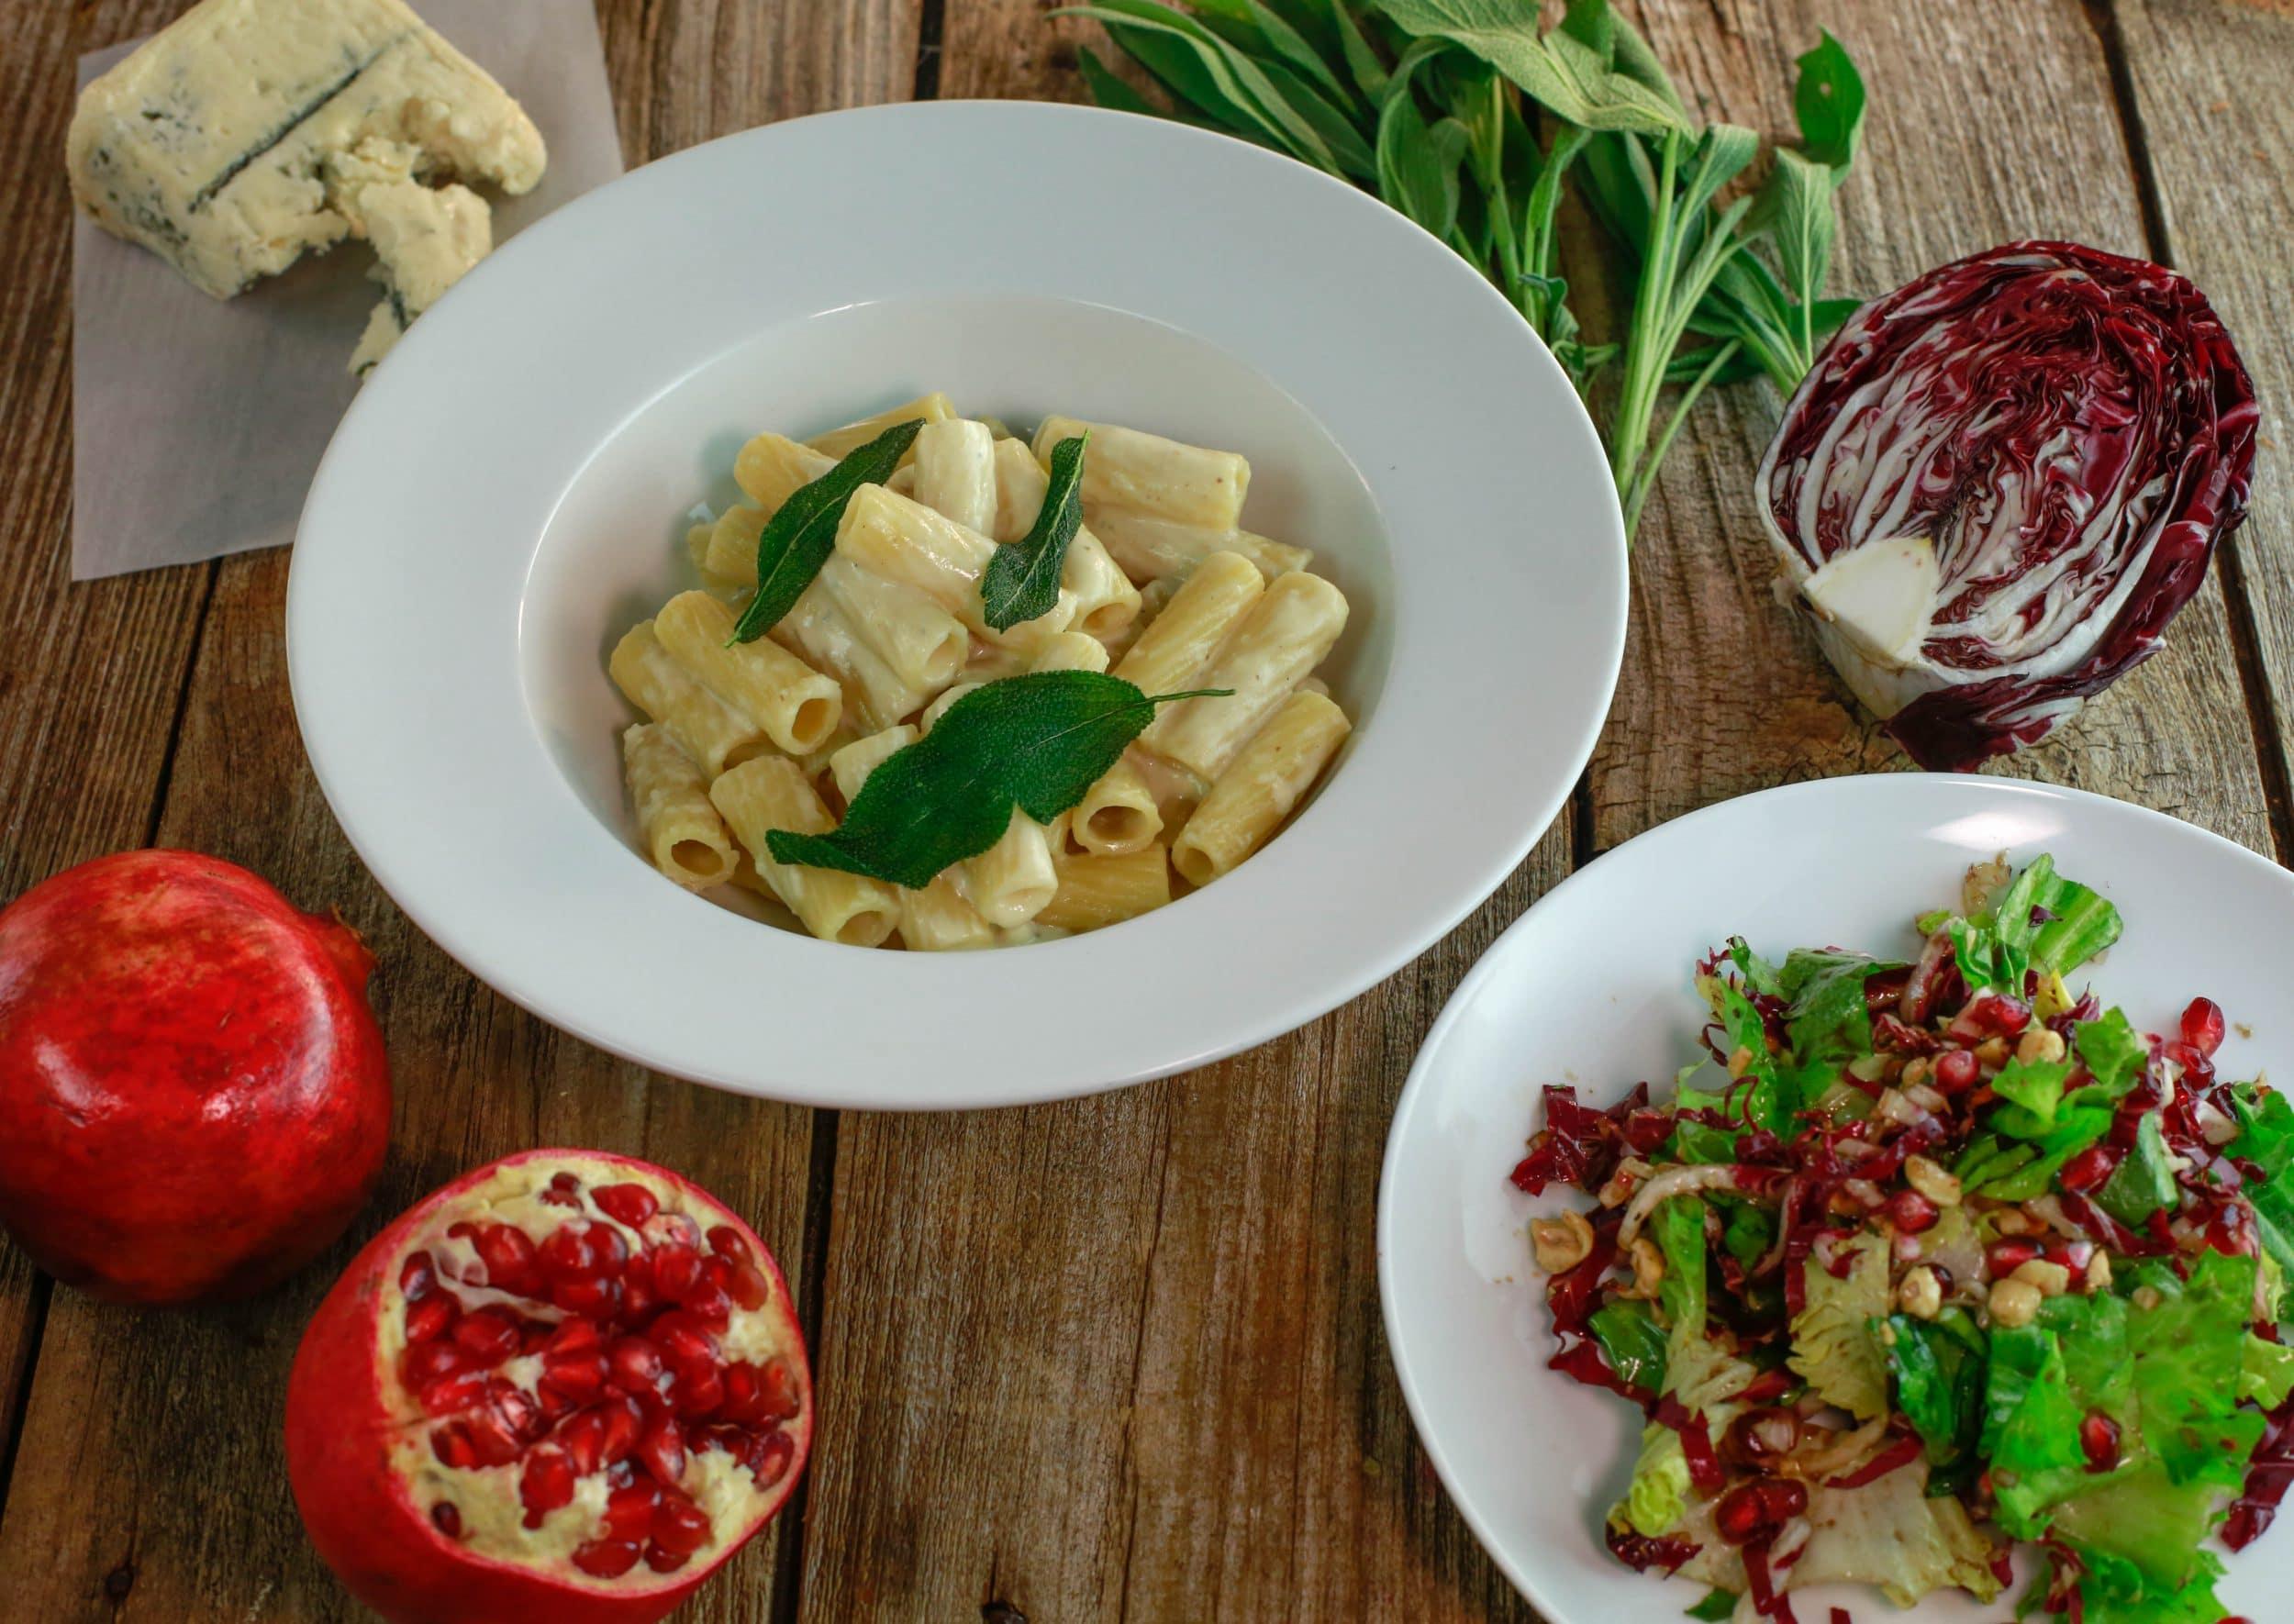 Rigatoni Quattro Formaggi with Roasted Garlic and Crispy Sage, and Escarole Salad